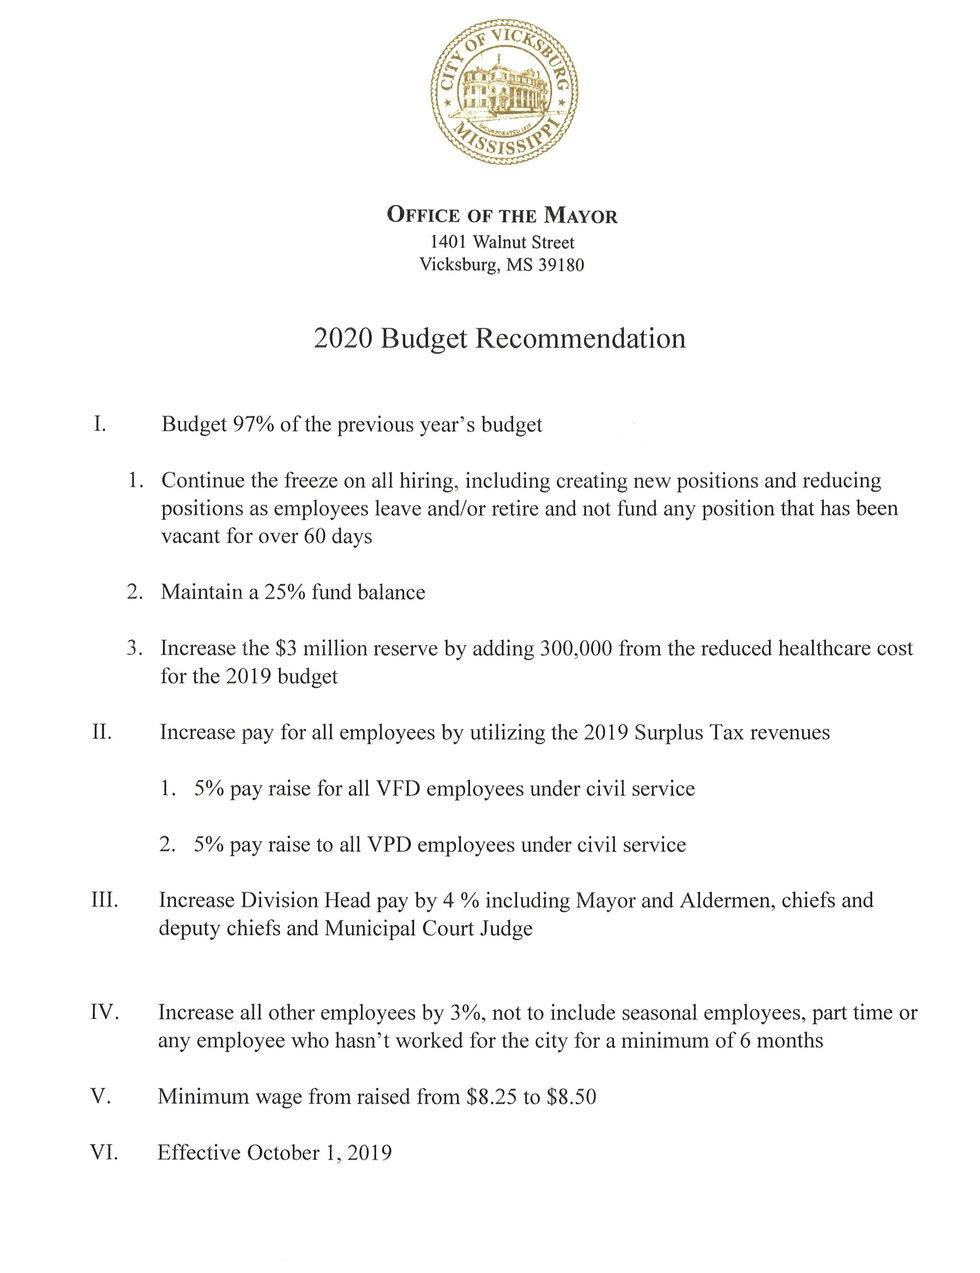 Vicksburg mayor announces proposed minimum wage increase for city employees. Source: Mayor...